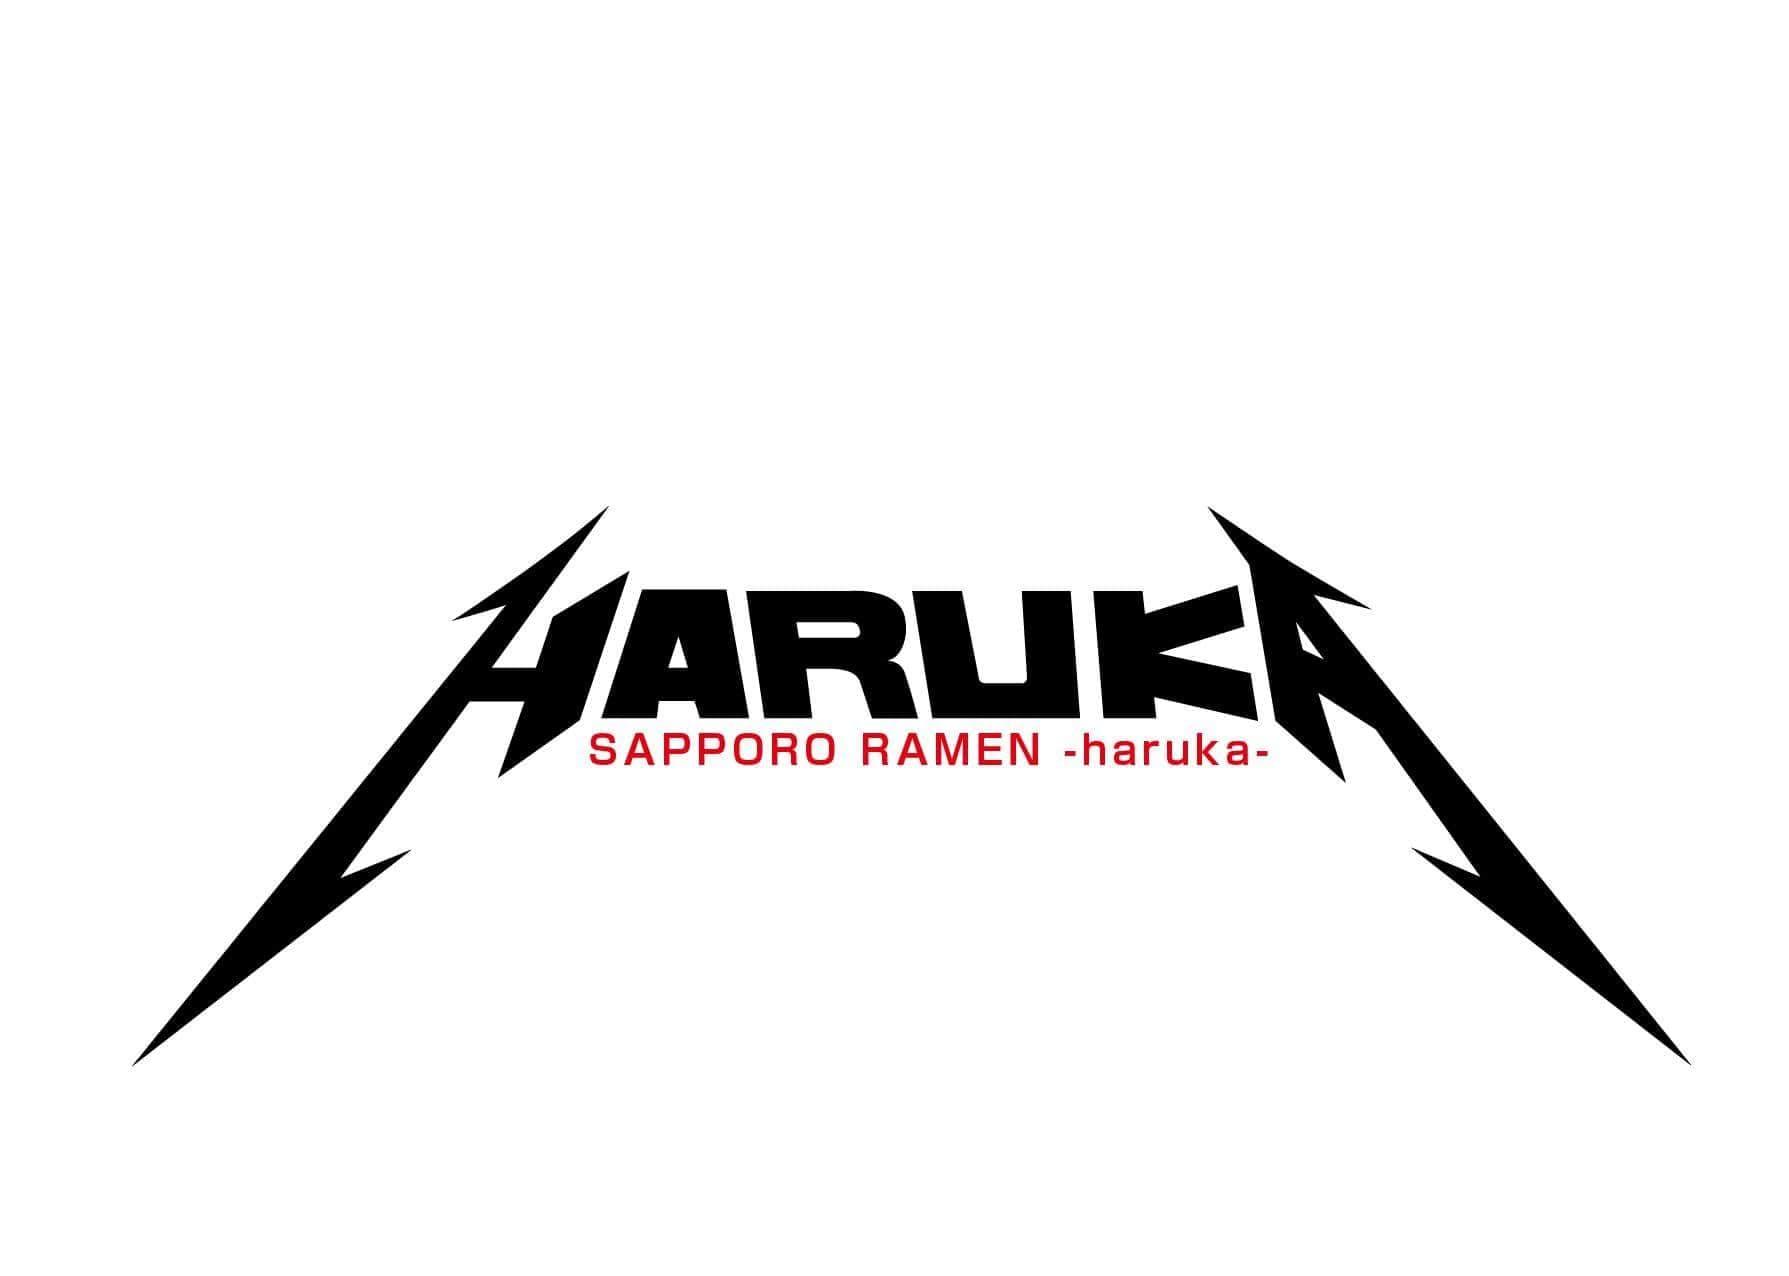 Sapporo Ramen Haruka